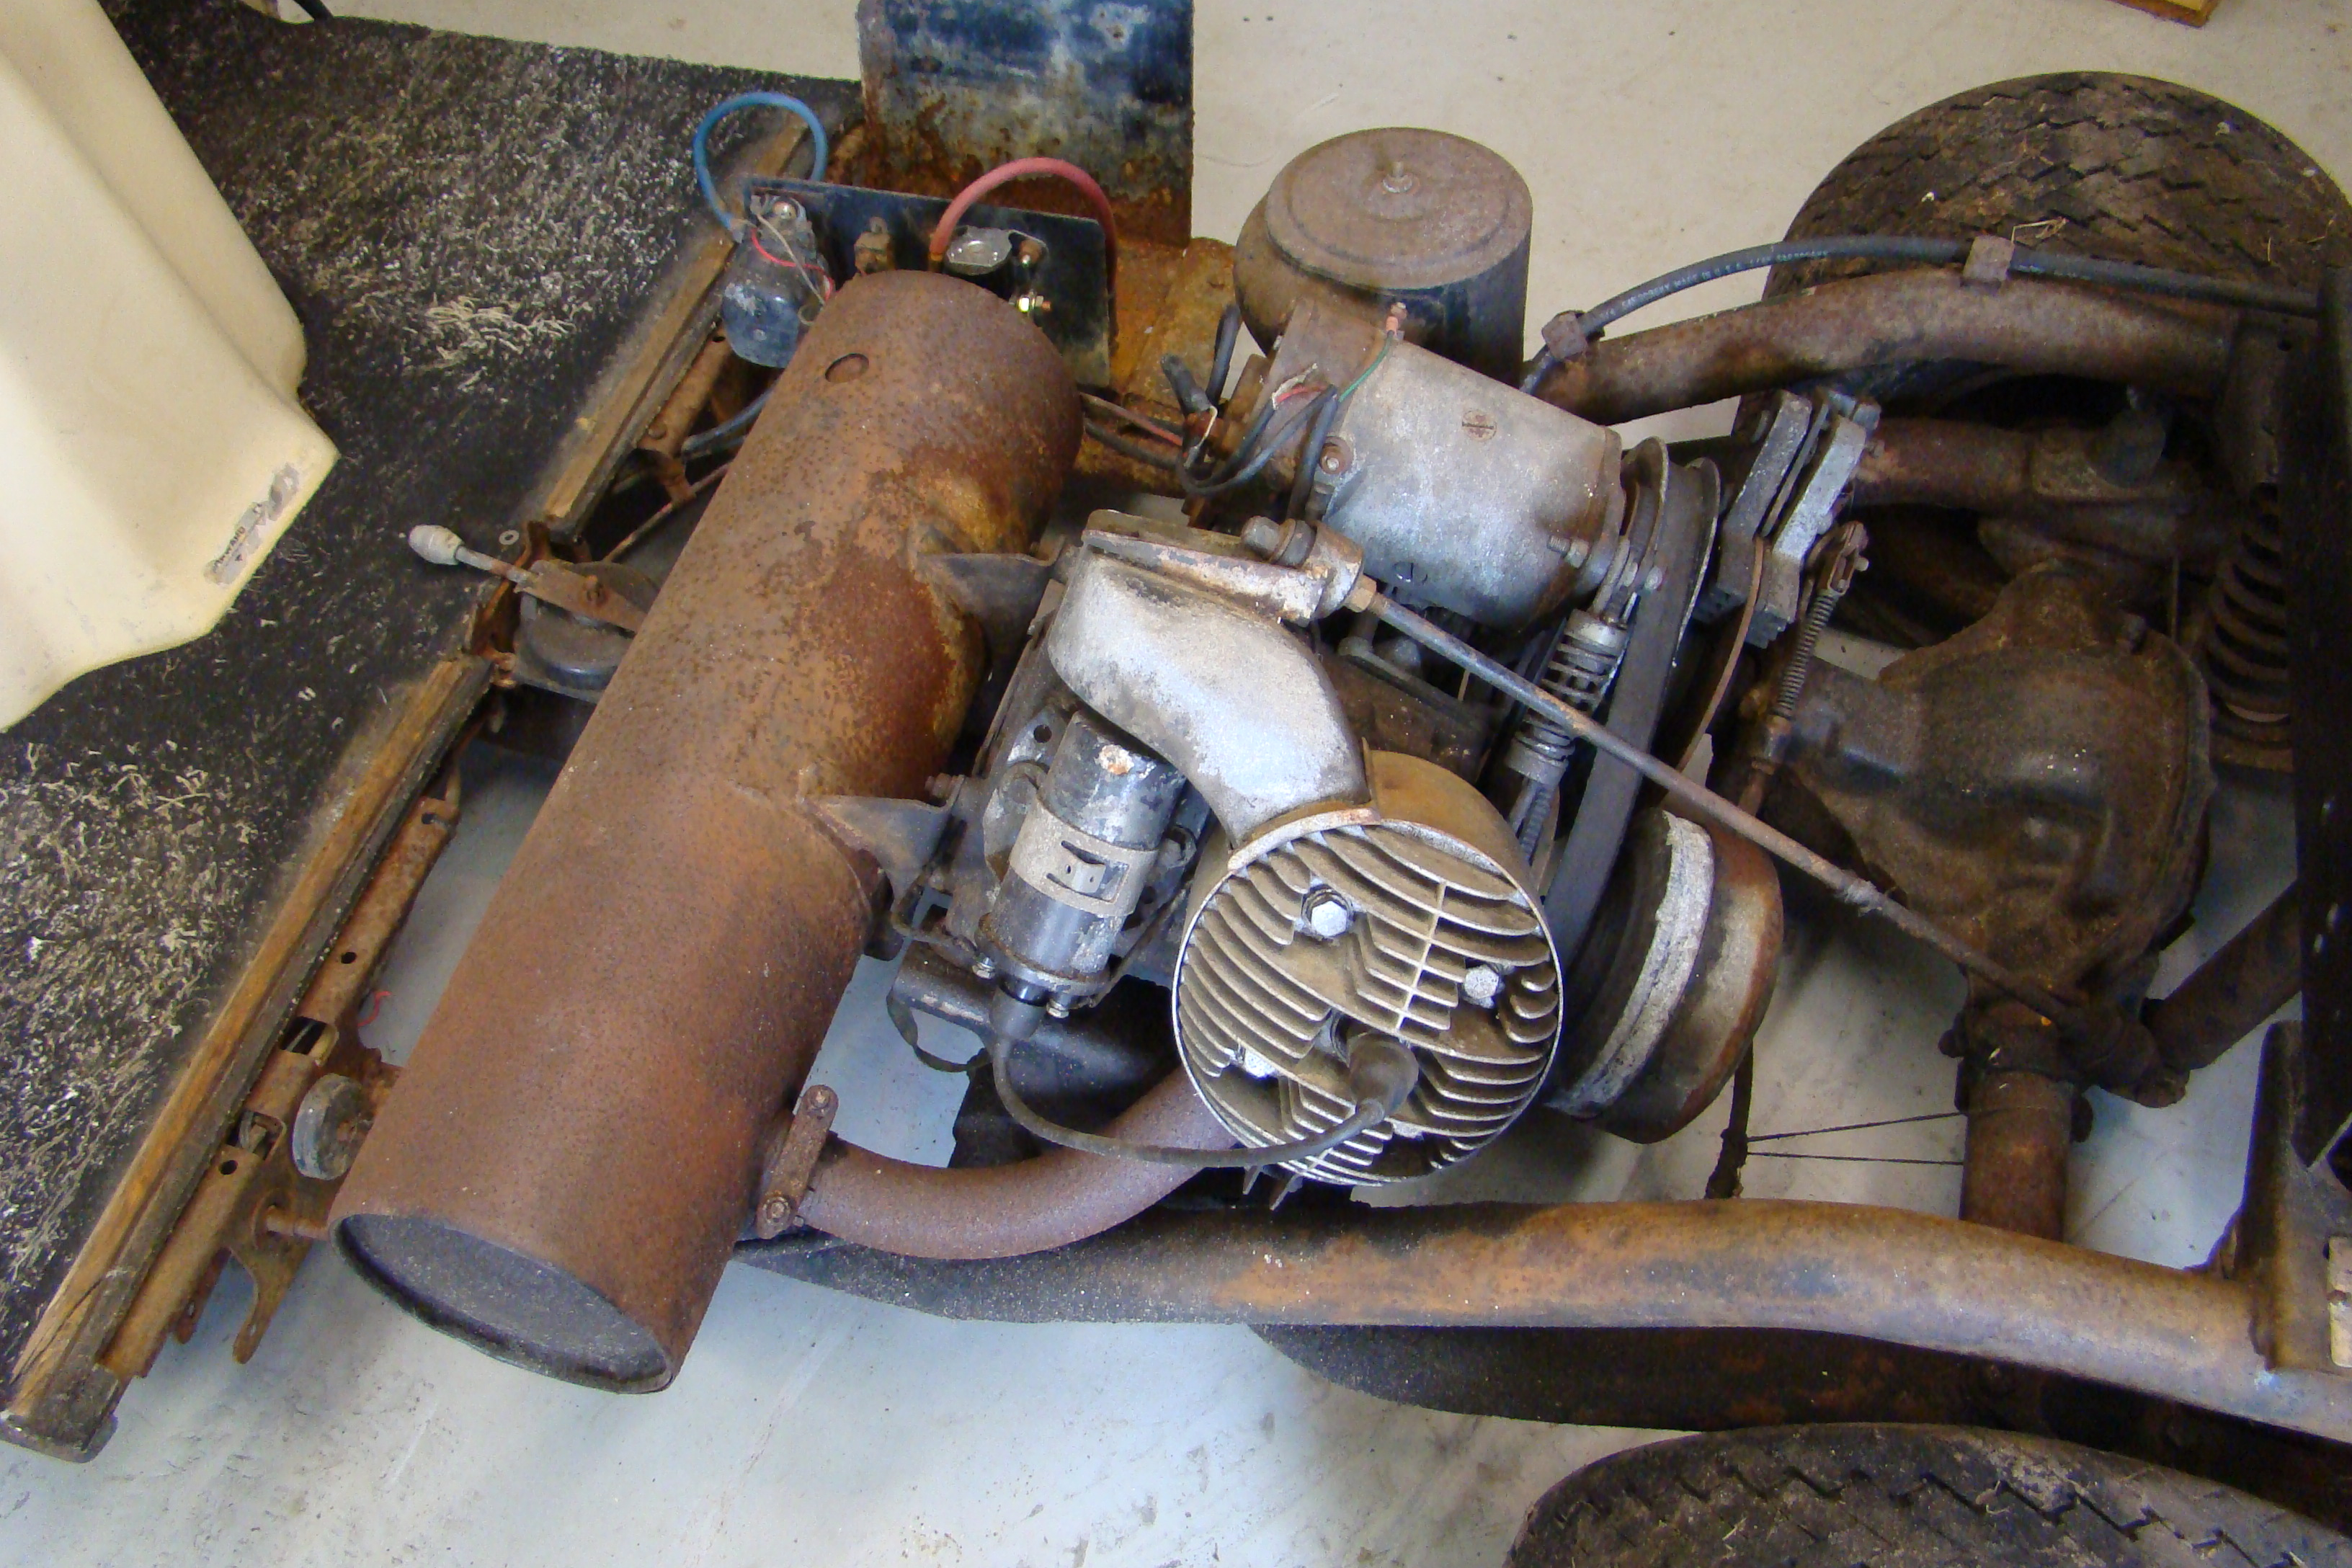 Harley Davidson 2 Cycle Engine Diagram - Wiring Diagram K8 on